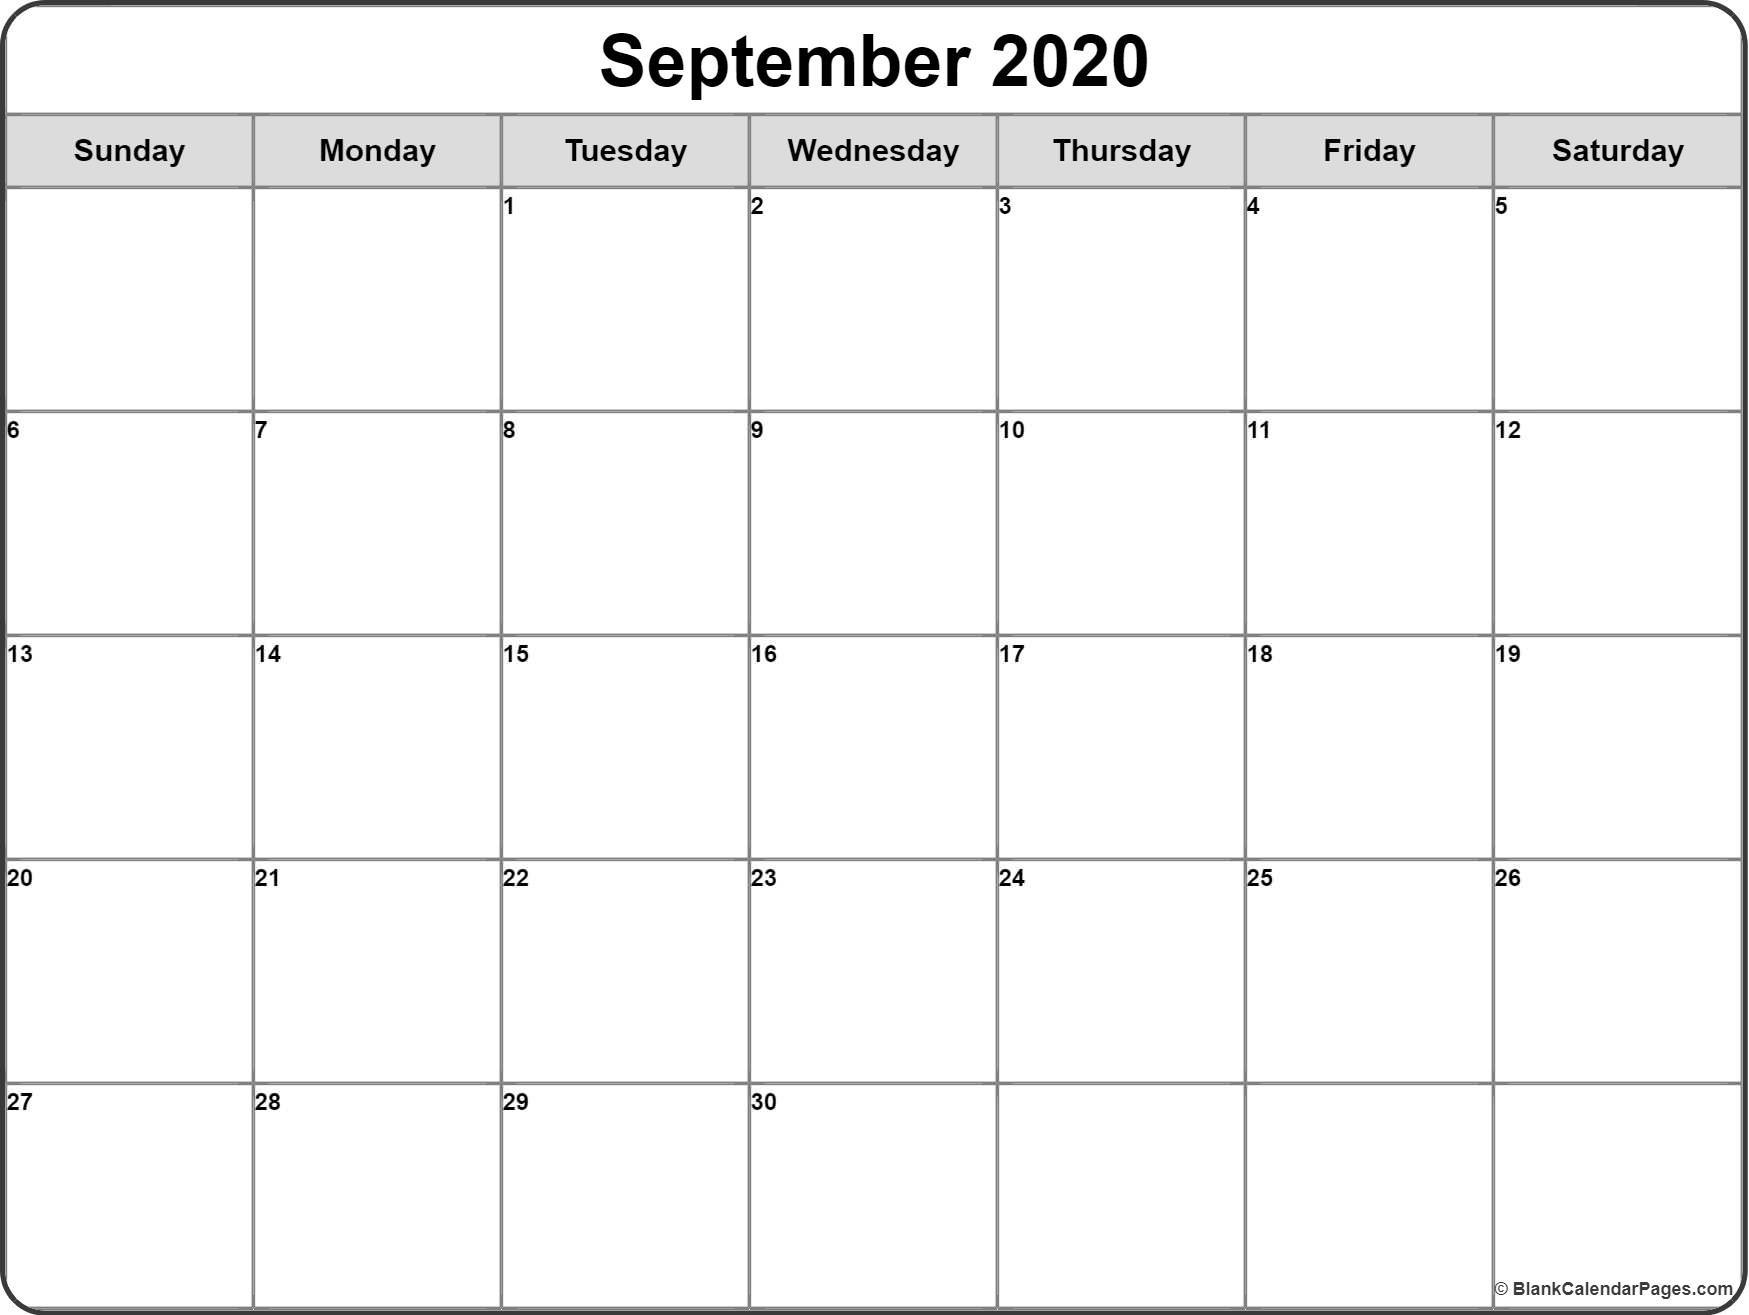 September 2020 Calendar | Free Printable Monthly Calendars-Blank Printable Calendar 2020 Monthly